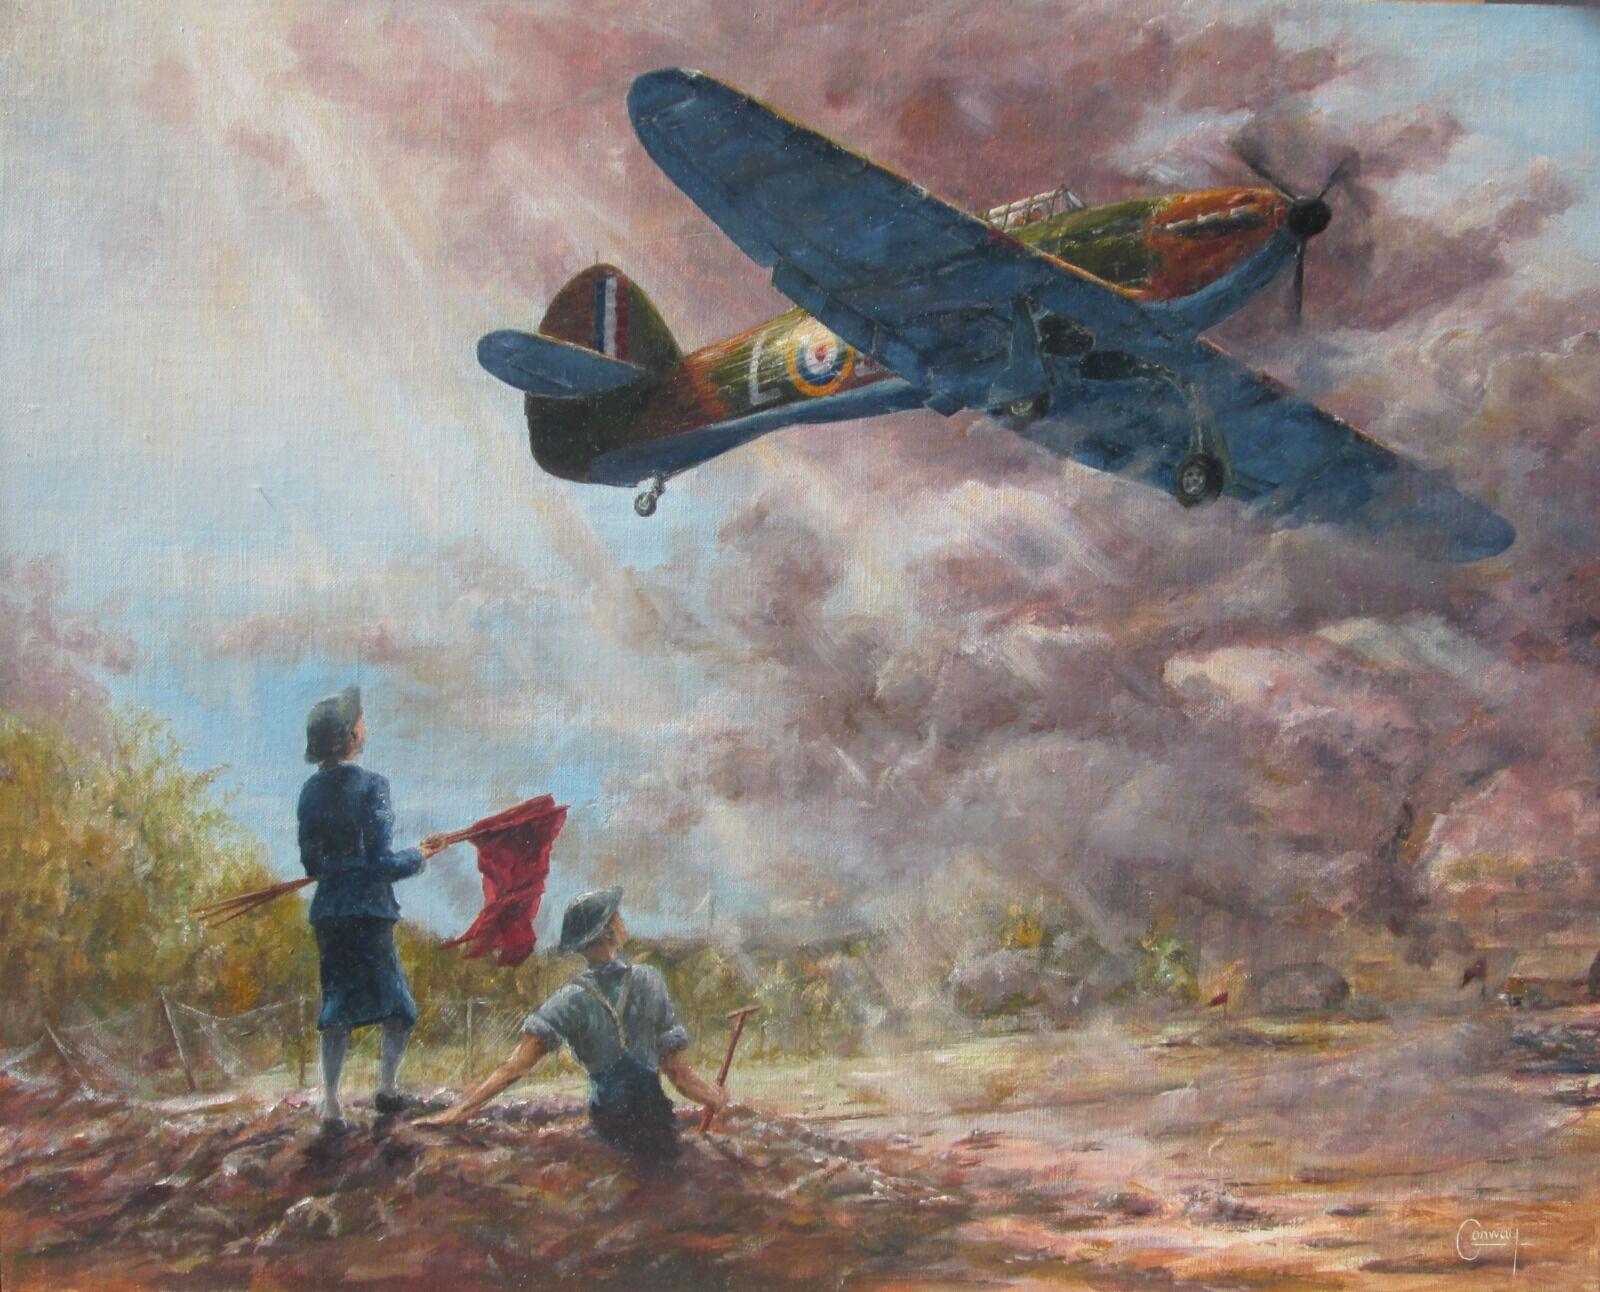 'Red Flags for UXBs' - WAAF Sgt. Joan Elizabeth Mortimer and F/Sgt. Joe Hunt watch Hurricane of P/O.Boleslaw Andrzej Wlasnowolski, No. 32 Squadron Landing